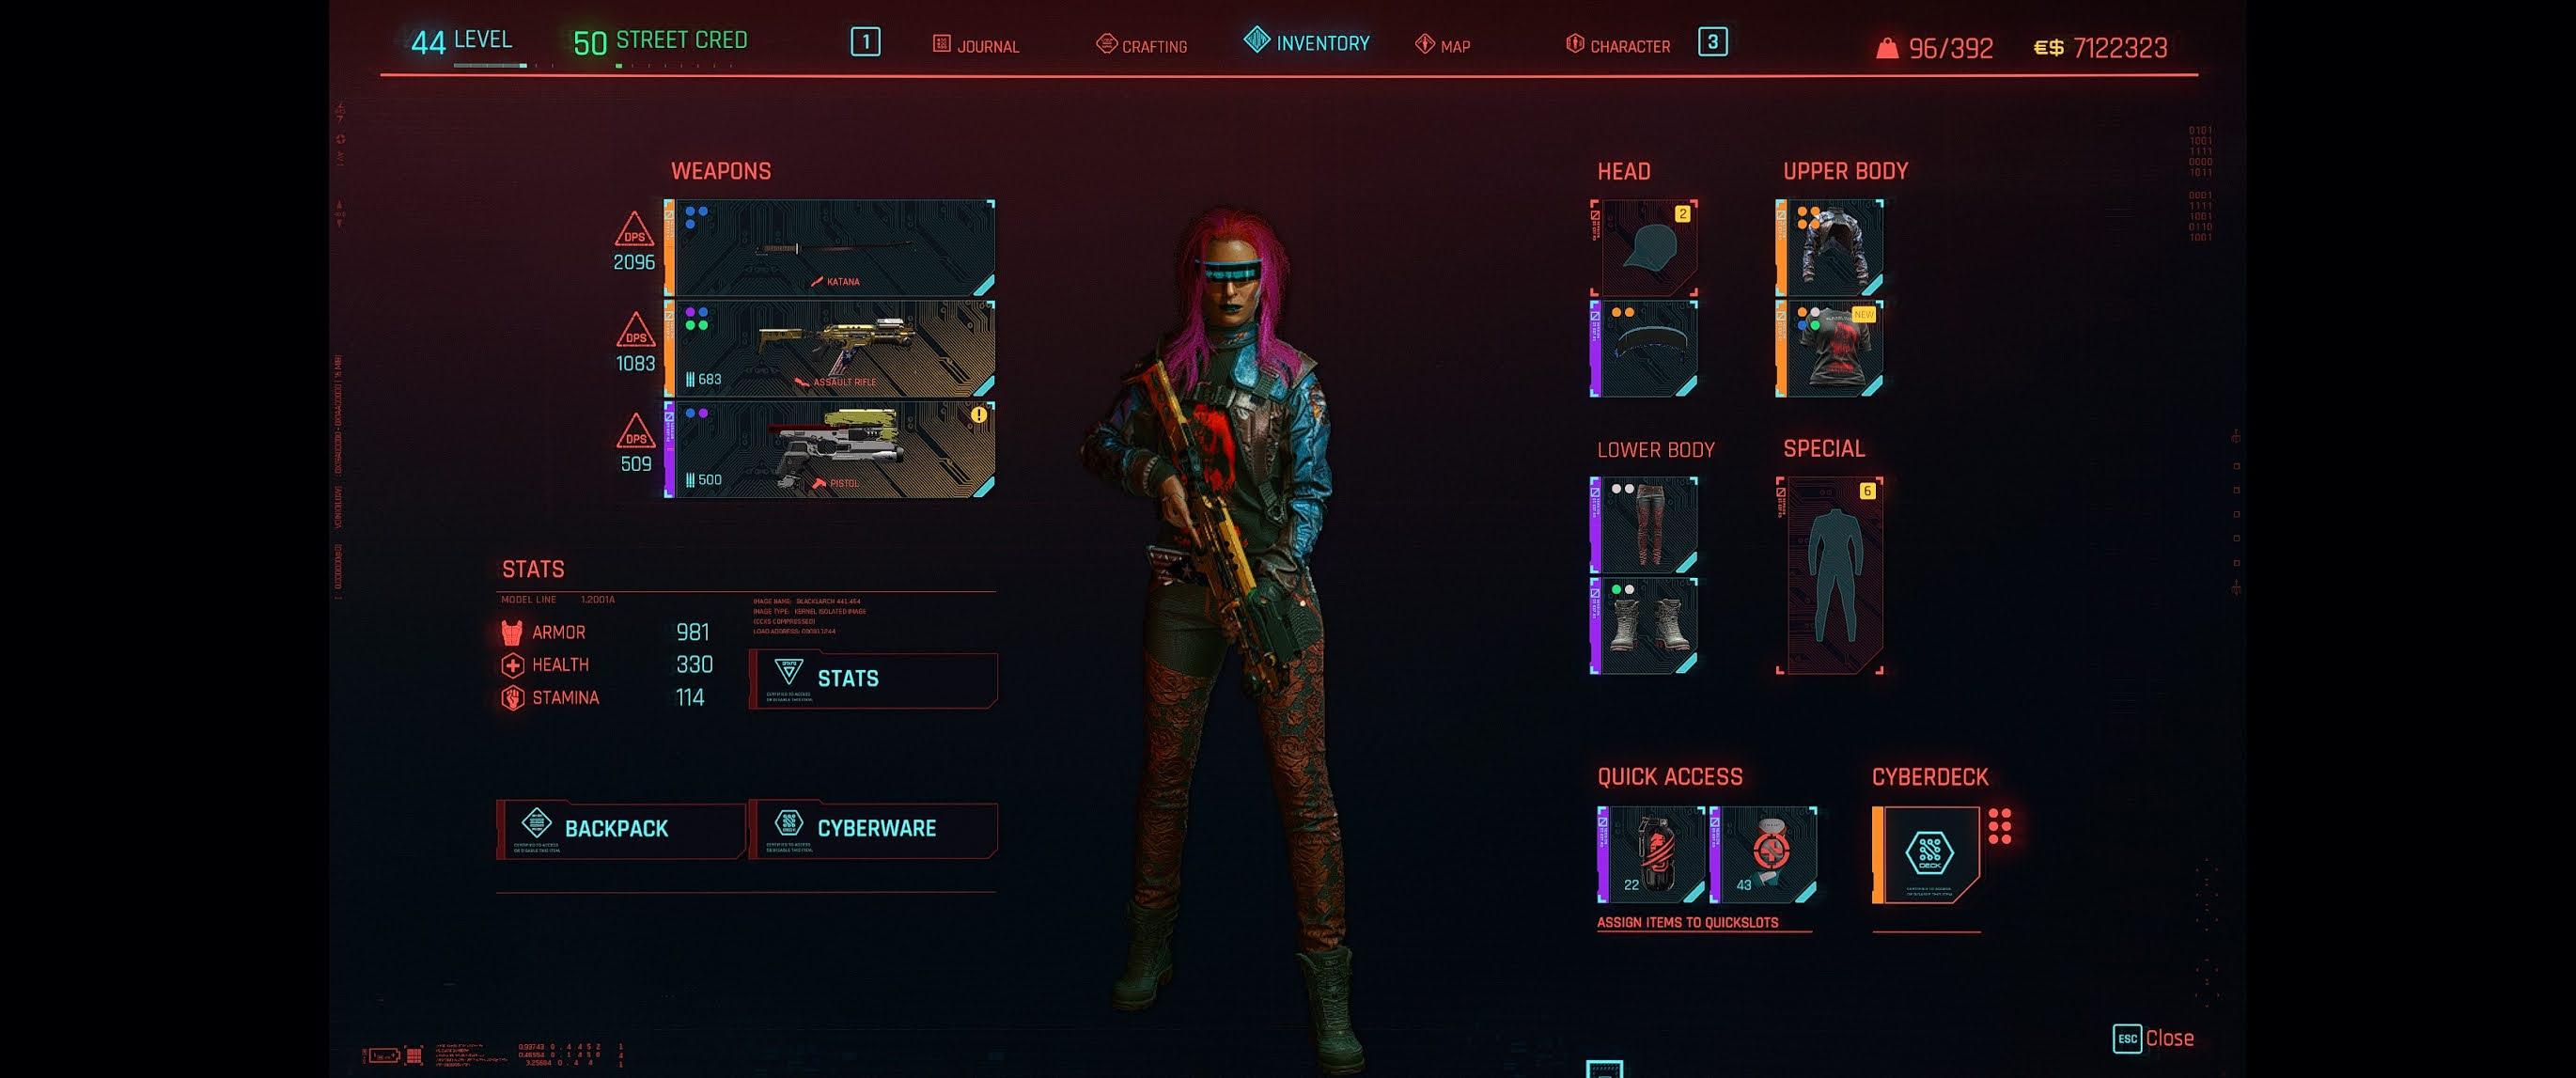 Cyberpunk 2077: 50 different saves